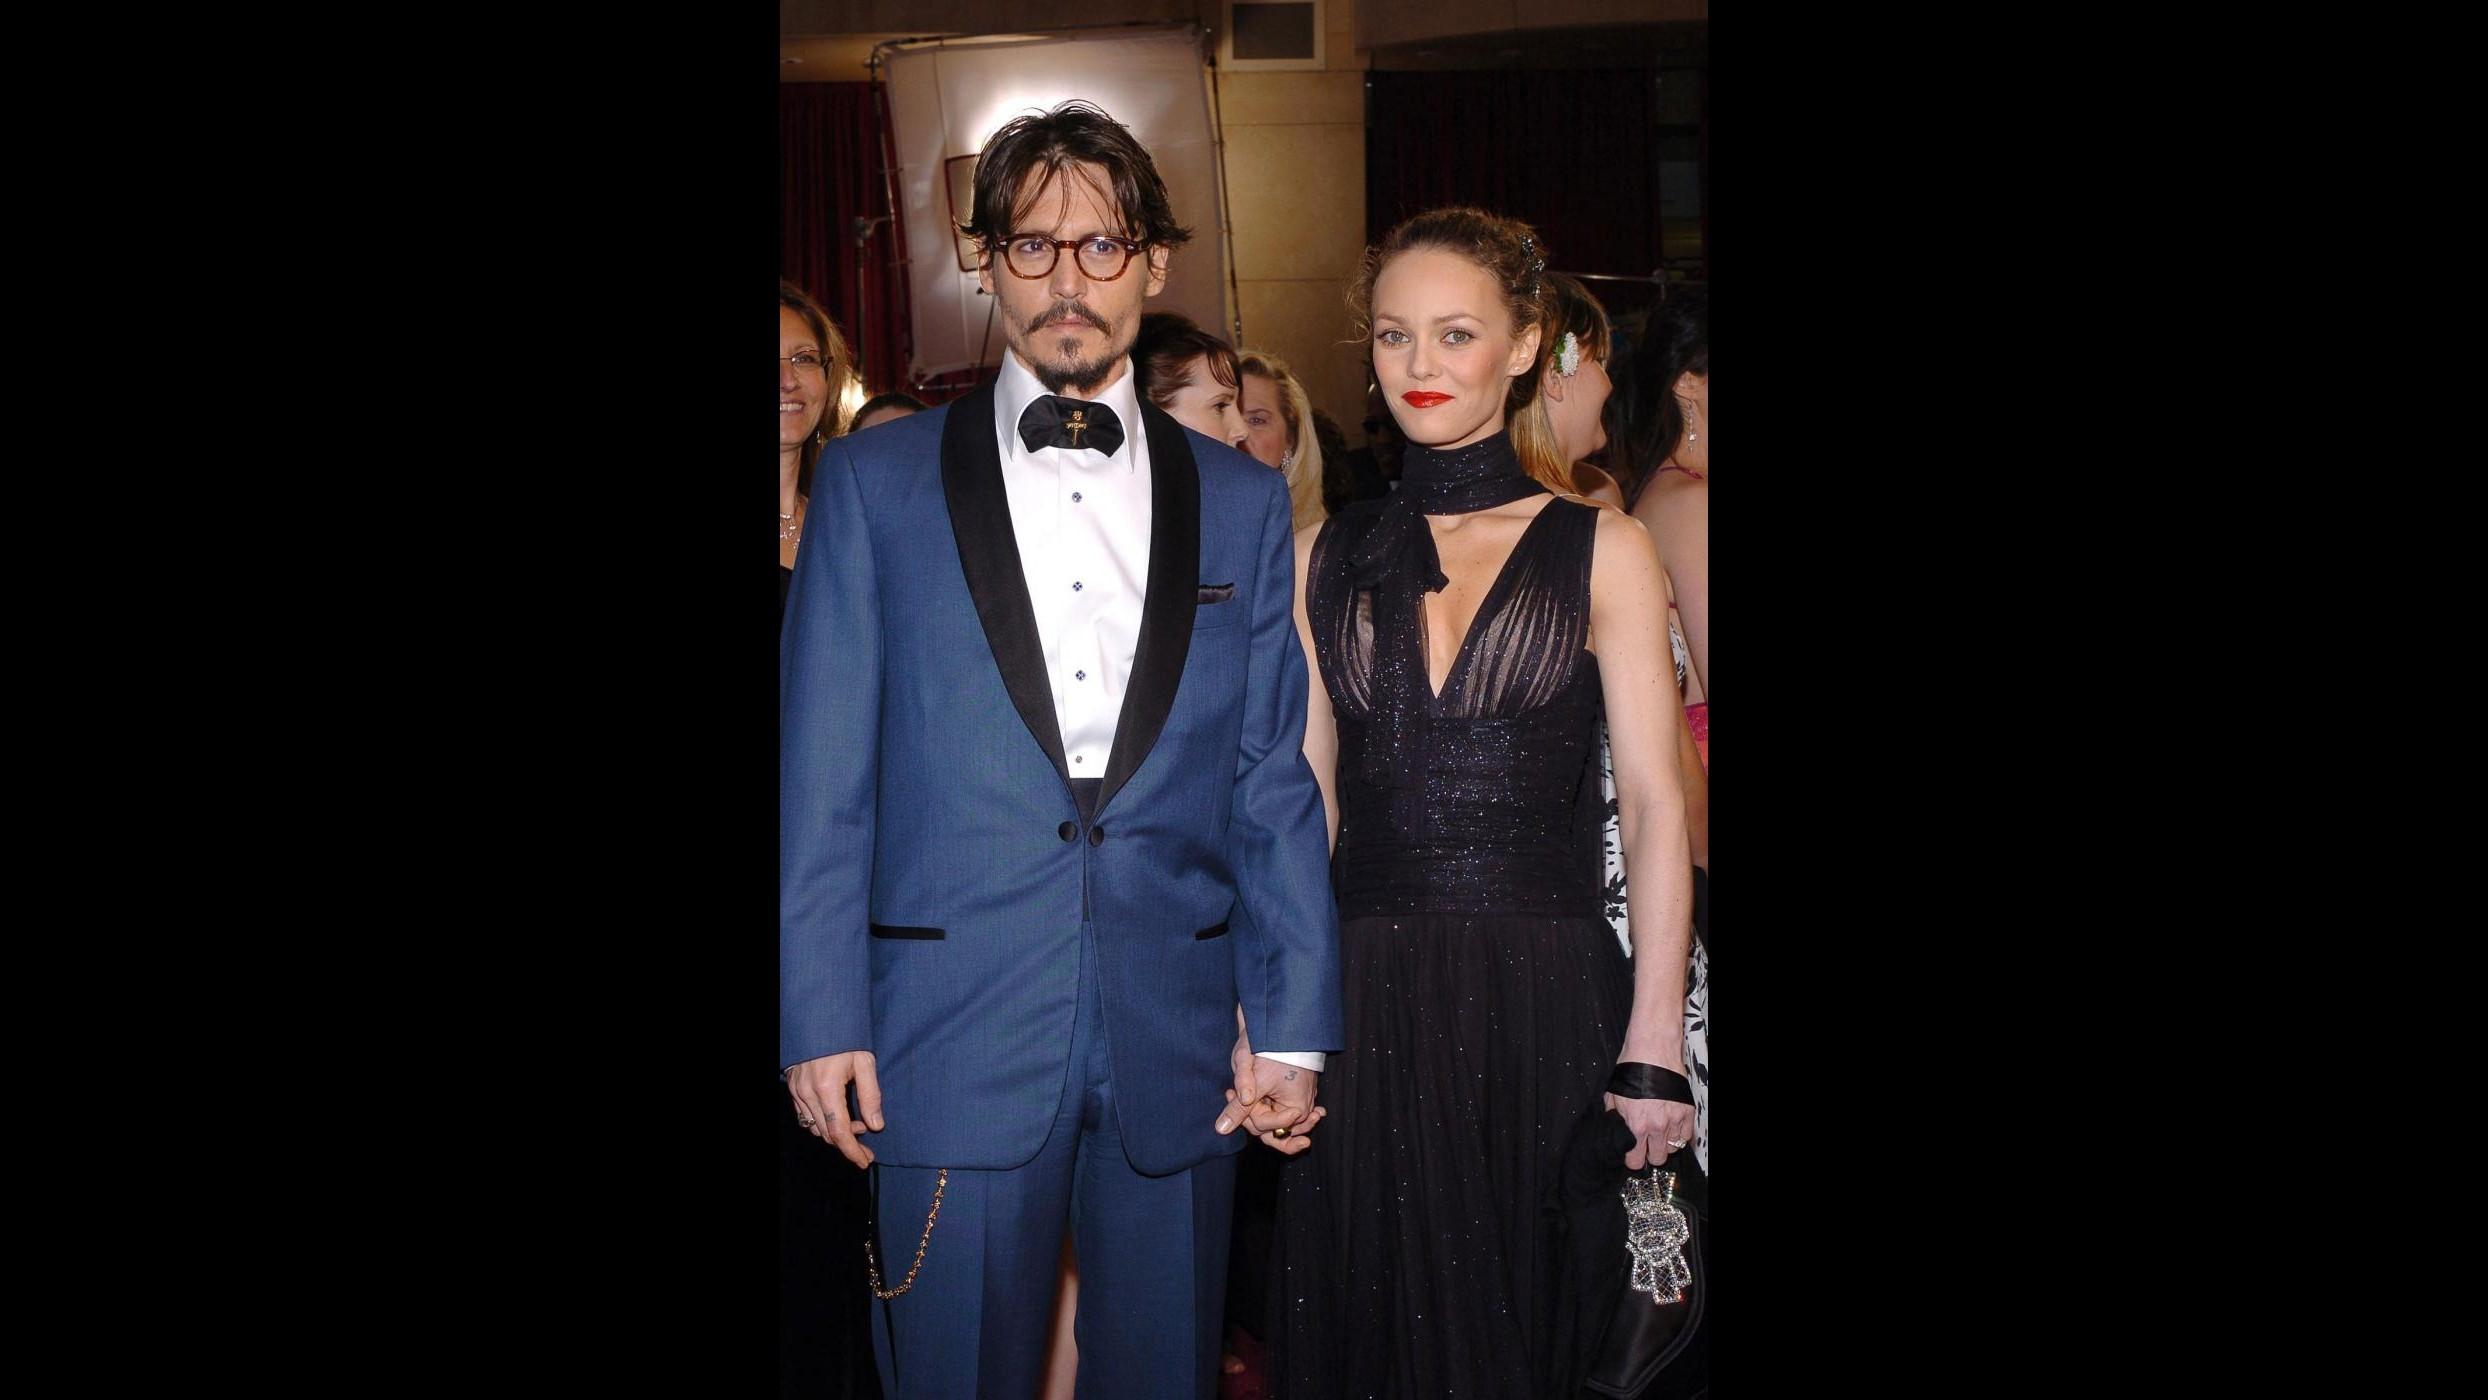 Johnny Depp era annoiato da Vanessa Paradis